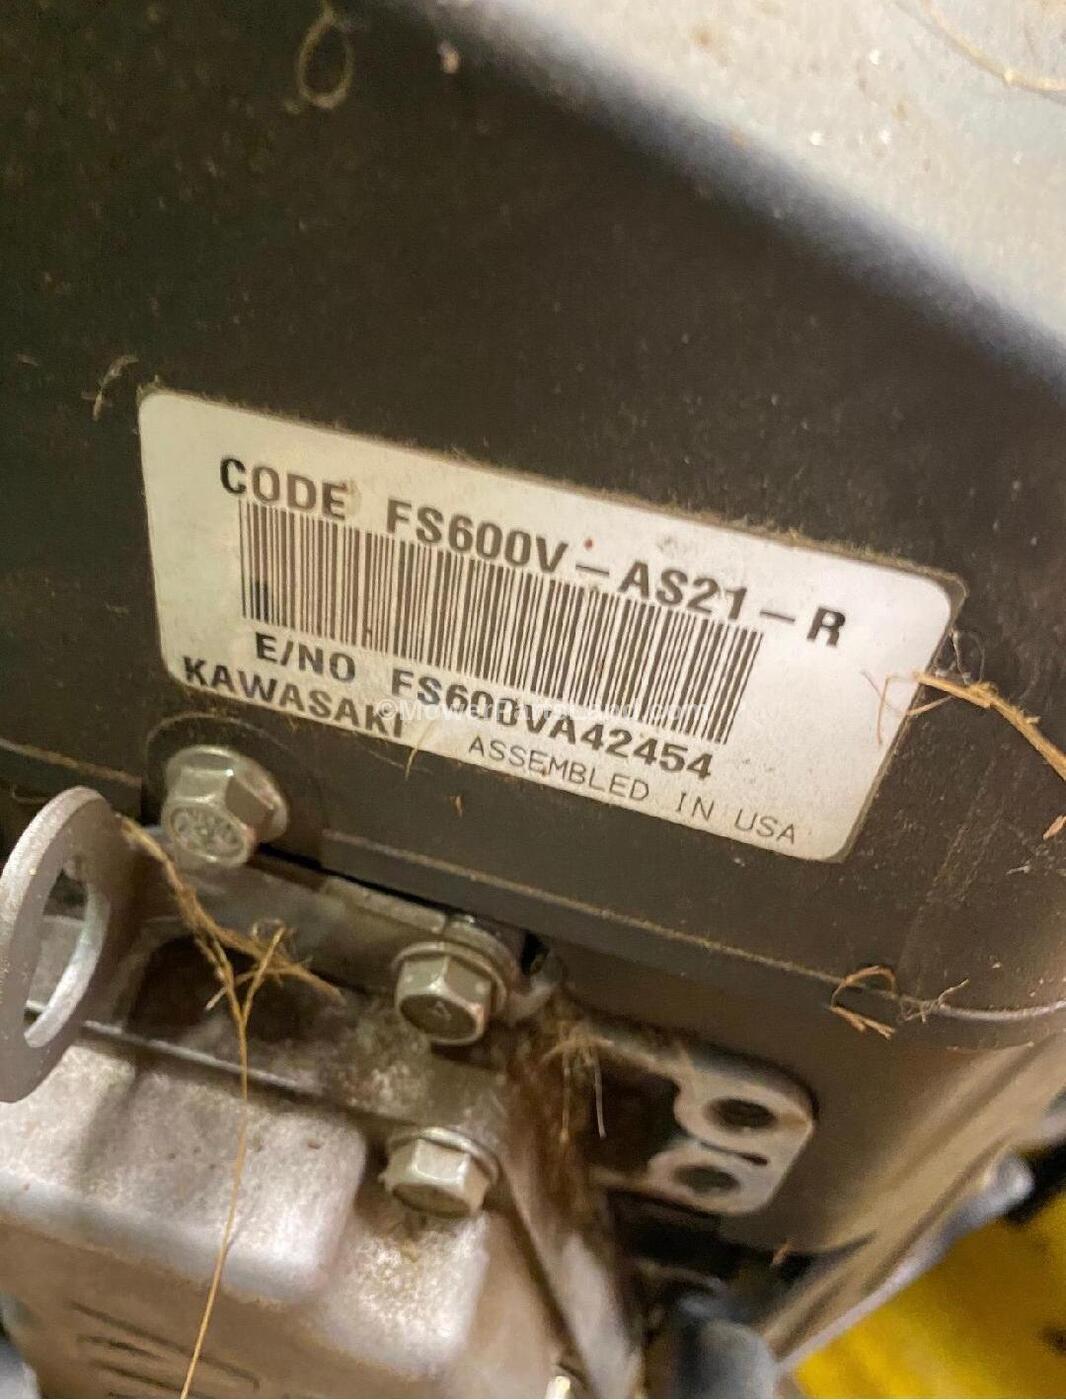 Carburetor For Kawasaki FS600V-AS21 Engine